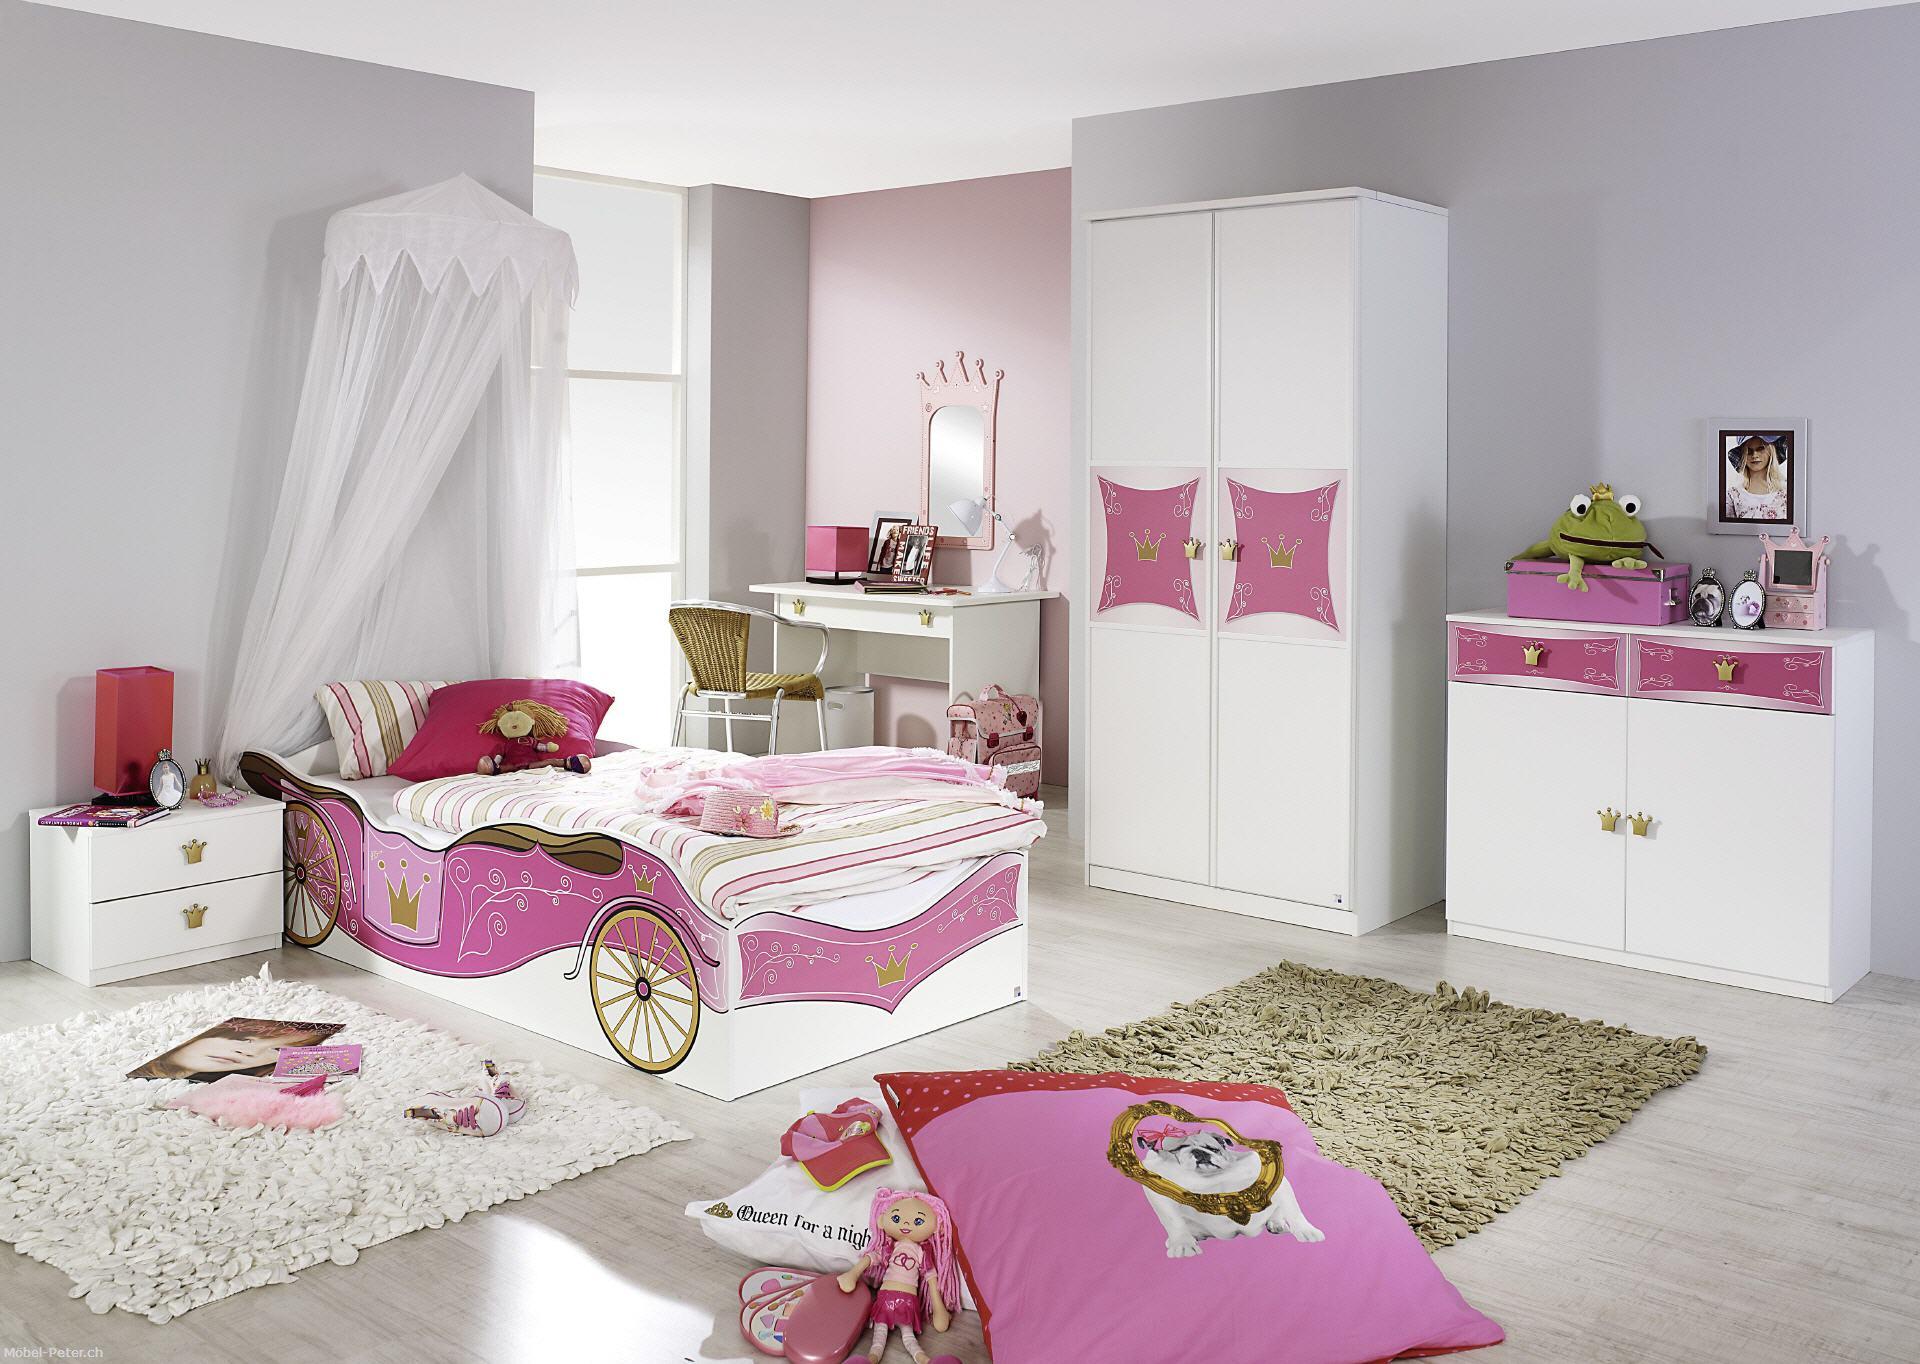 Full Size of Kinderzimmer Prinzessin Mbel Peterch Regal Prinzessinen Bett Weiß Sofa Regale Kinderzimmer Kinderzimmer Prinzessin